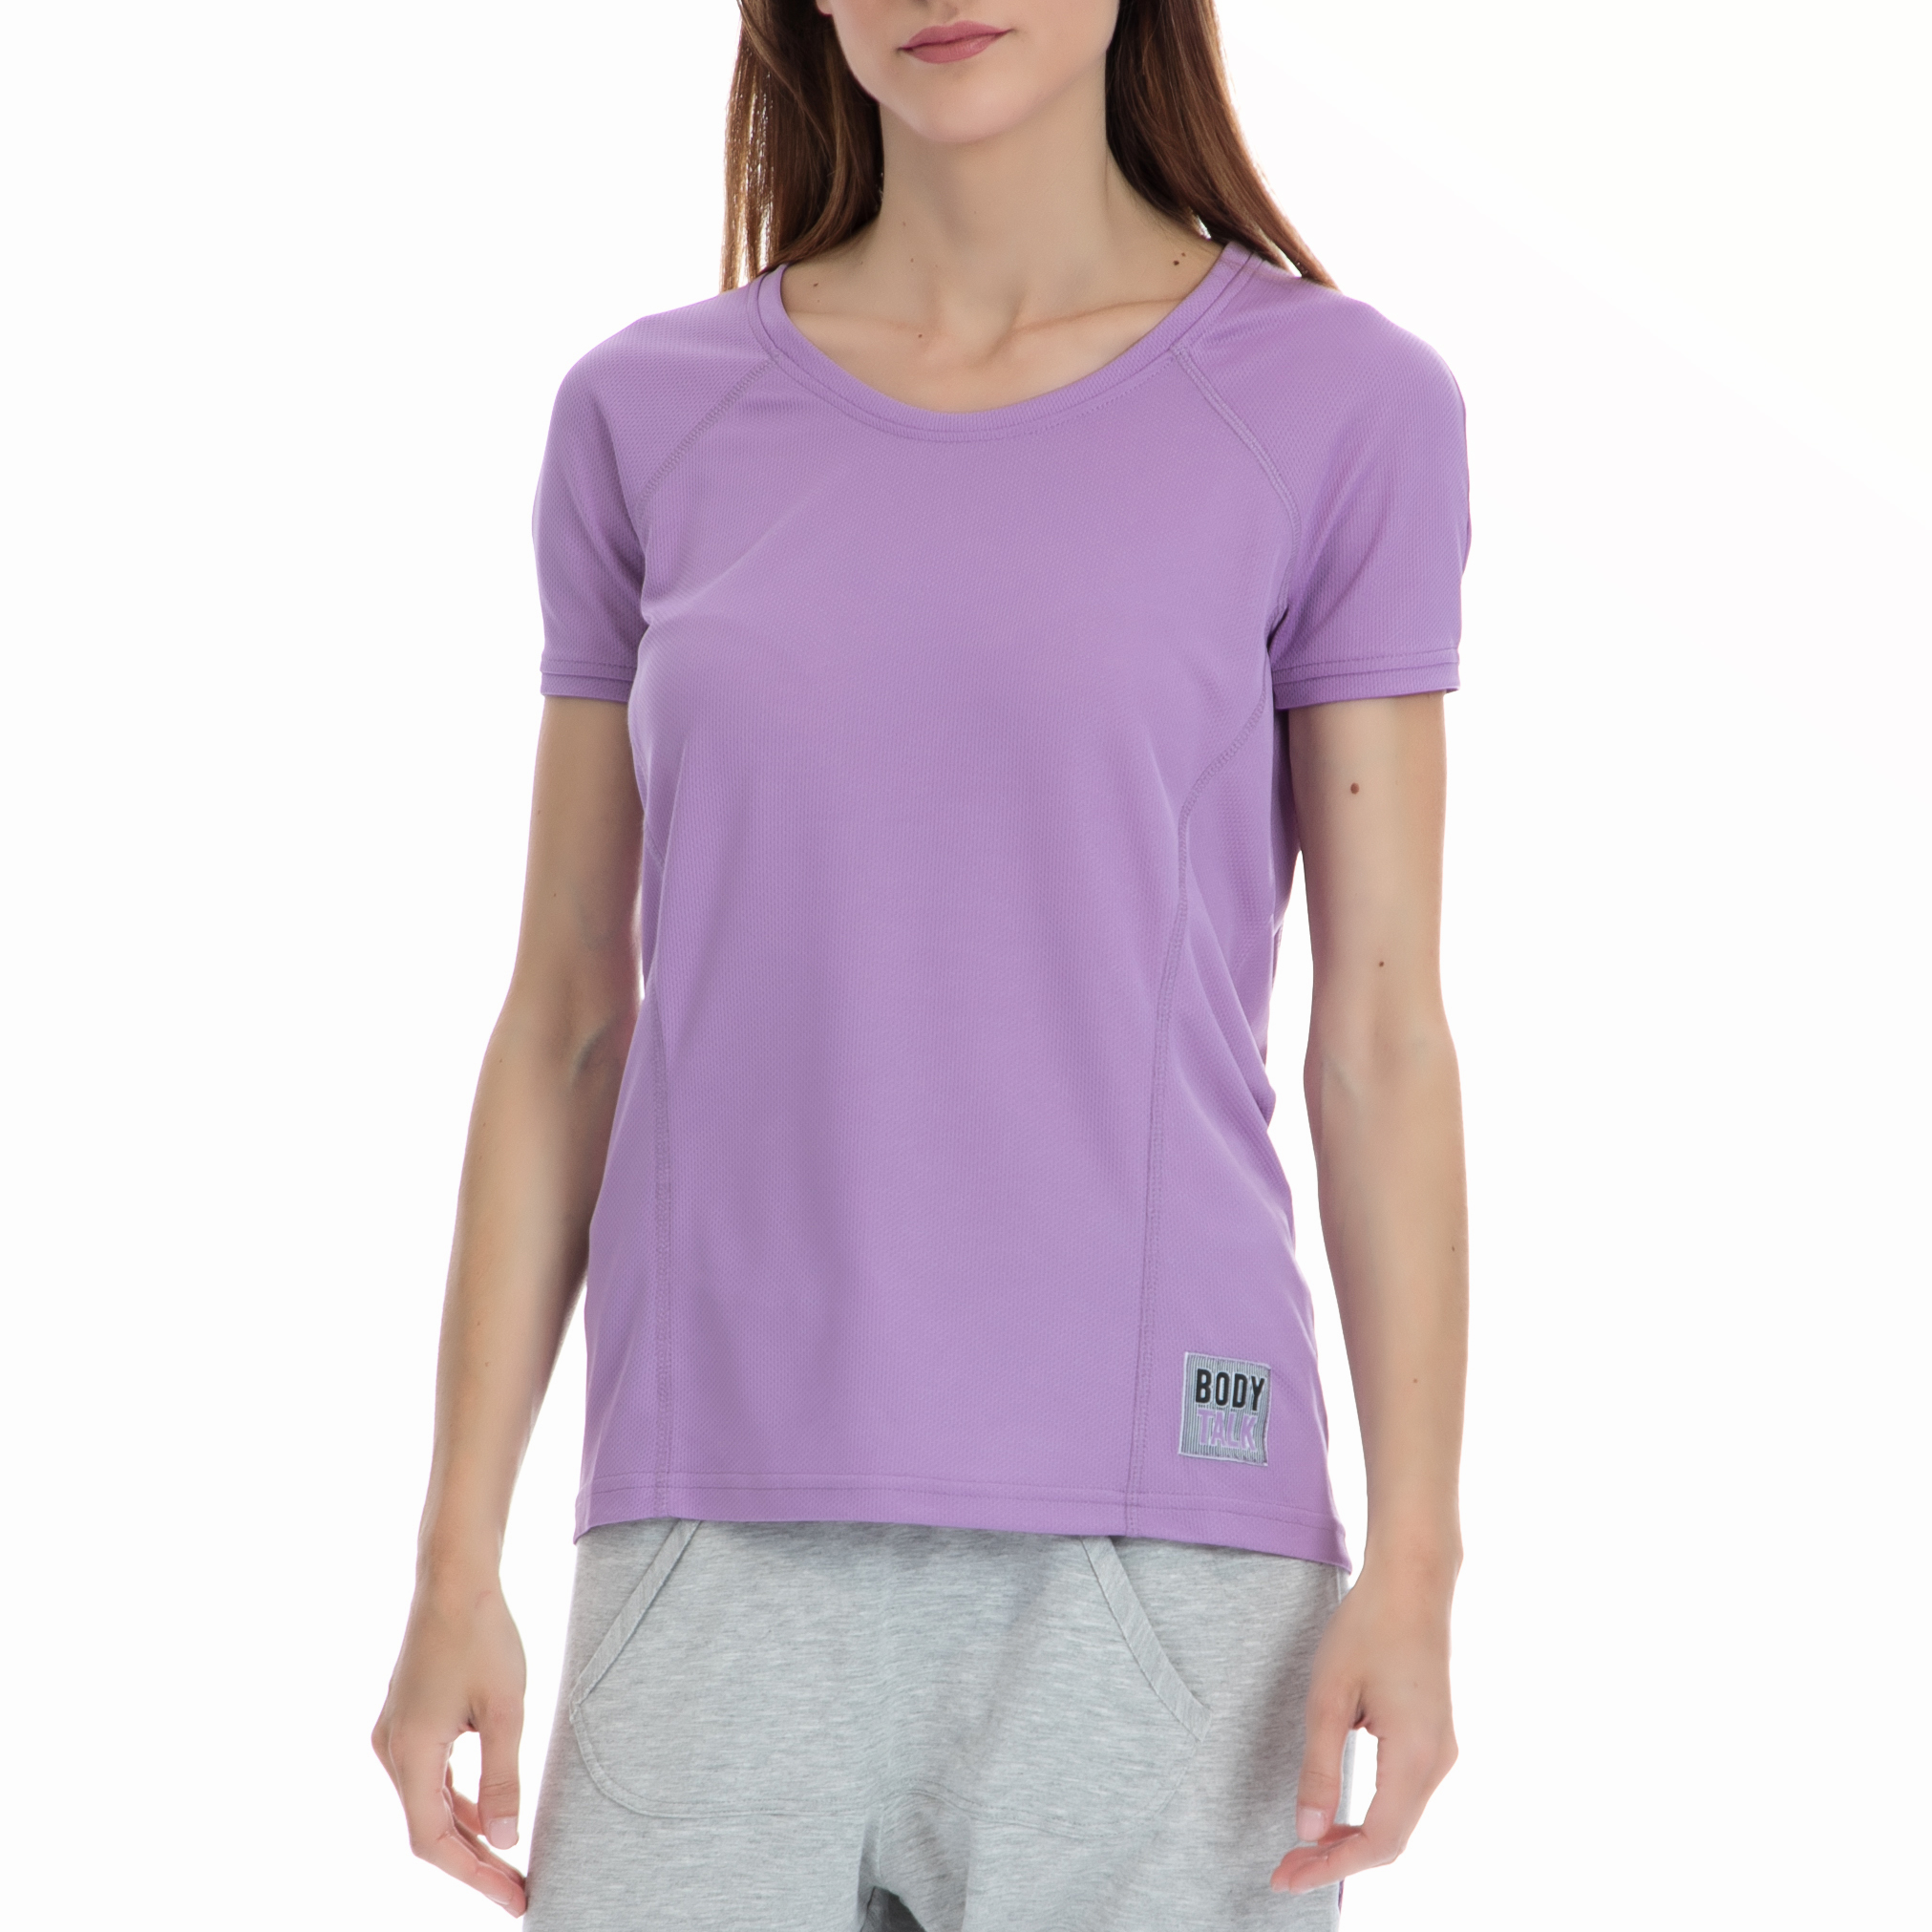 BODYTALK - Γυναικεία μπλούζα BODYTALK μωβ γυναικεία ρούχα αθλητικά t shirt τοπ